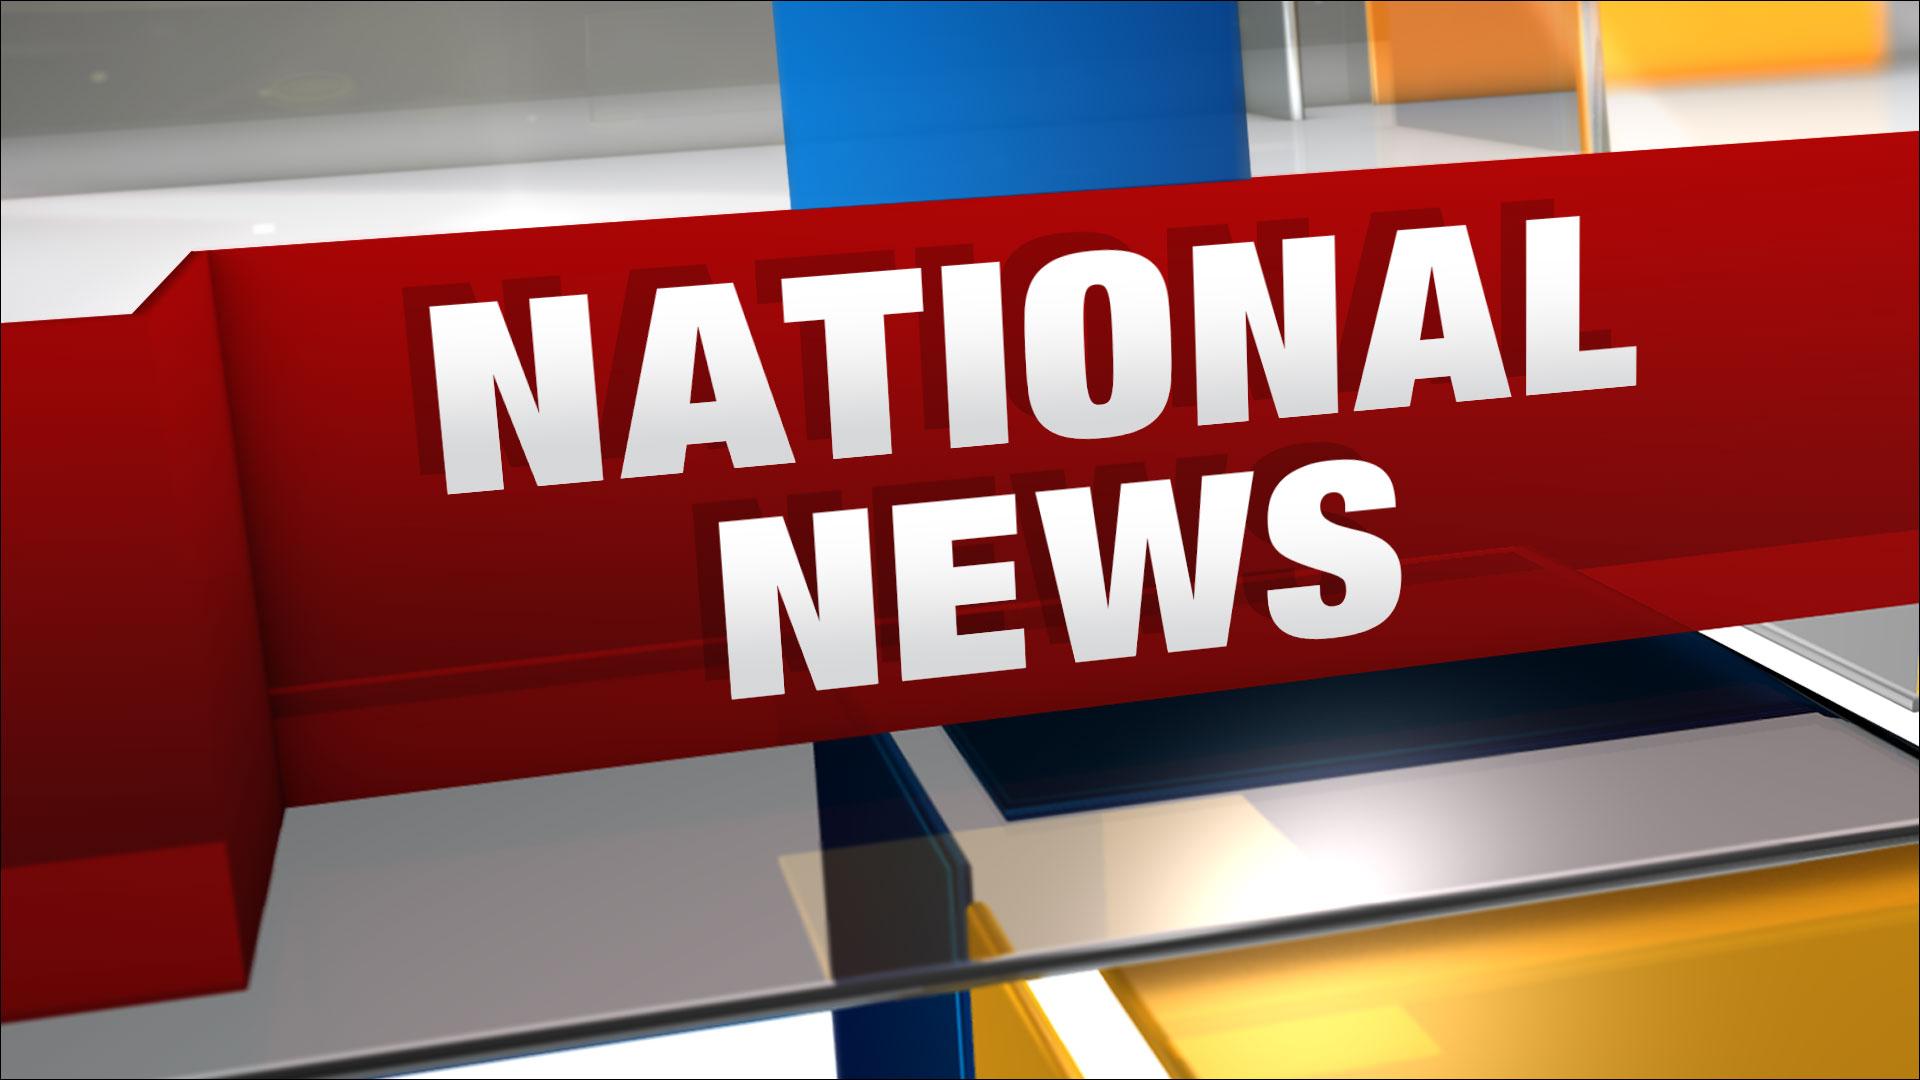 NATIONAL NEWS Generic